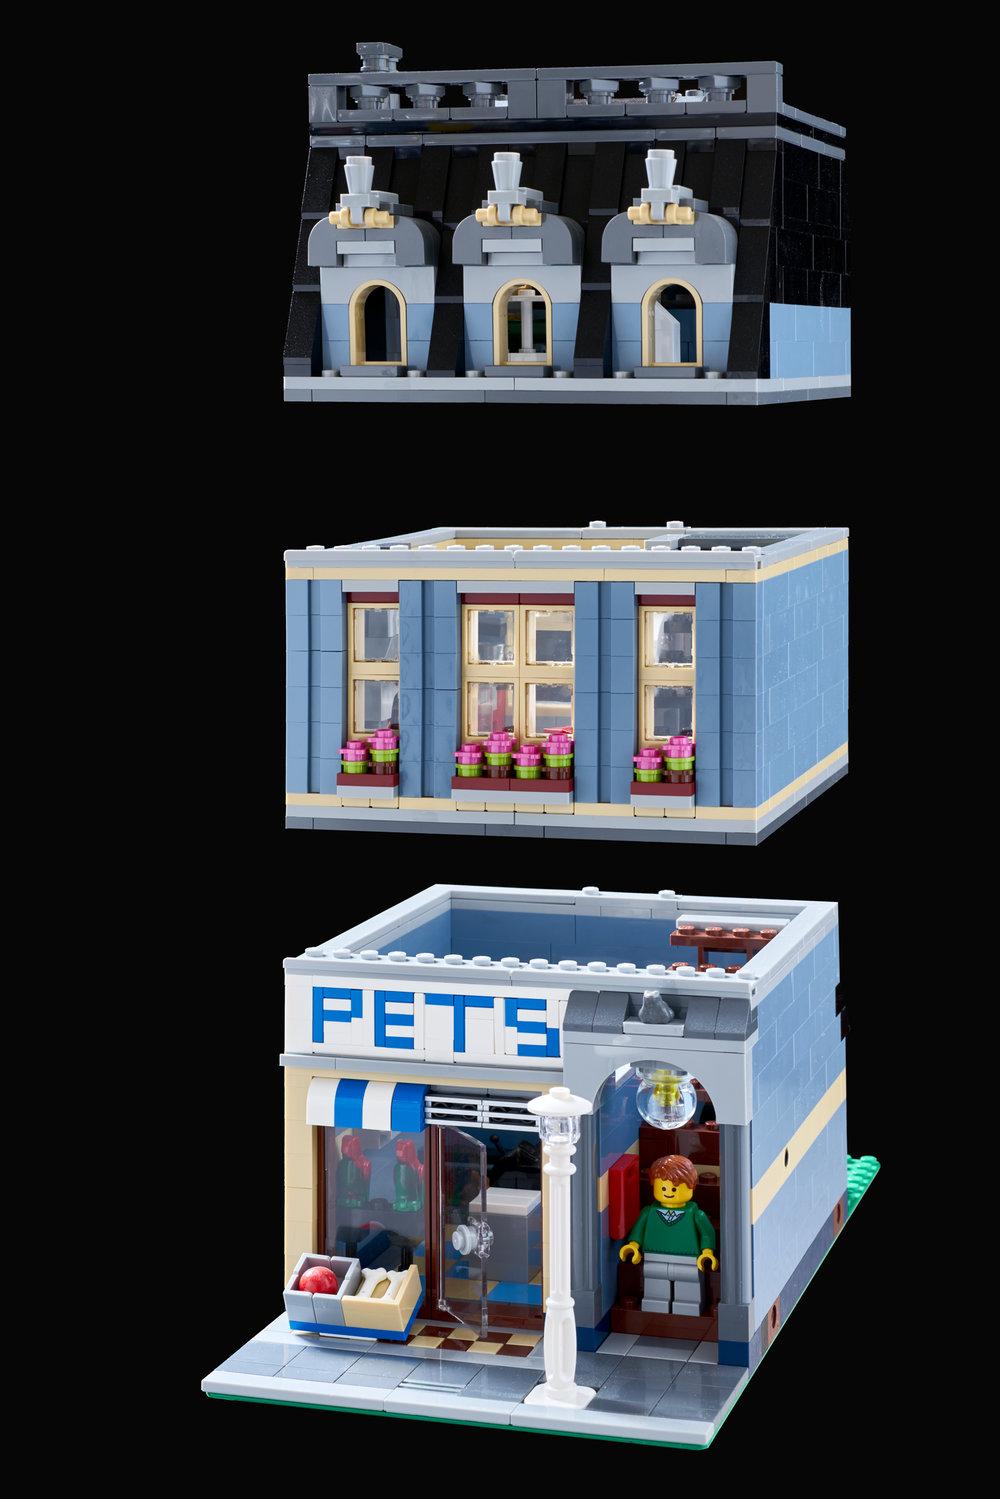 Pet_shop.jpg